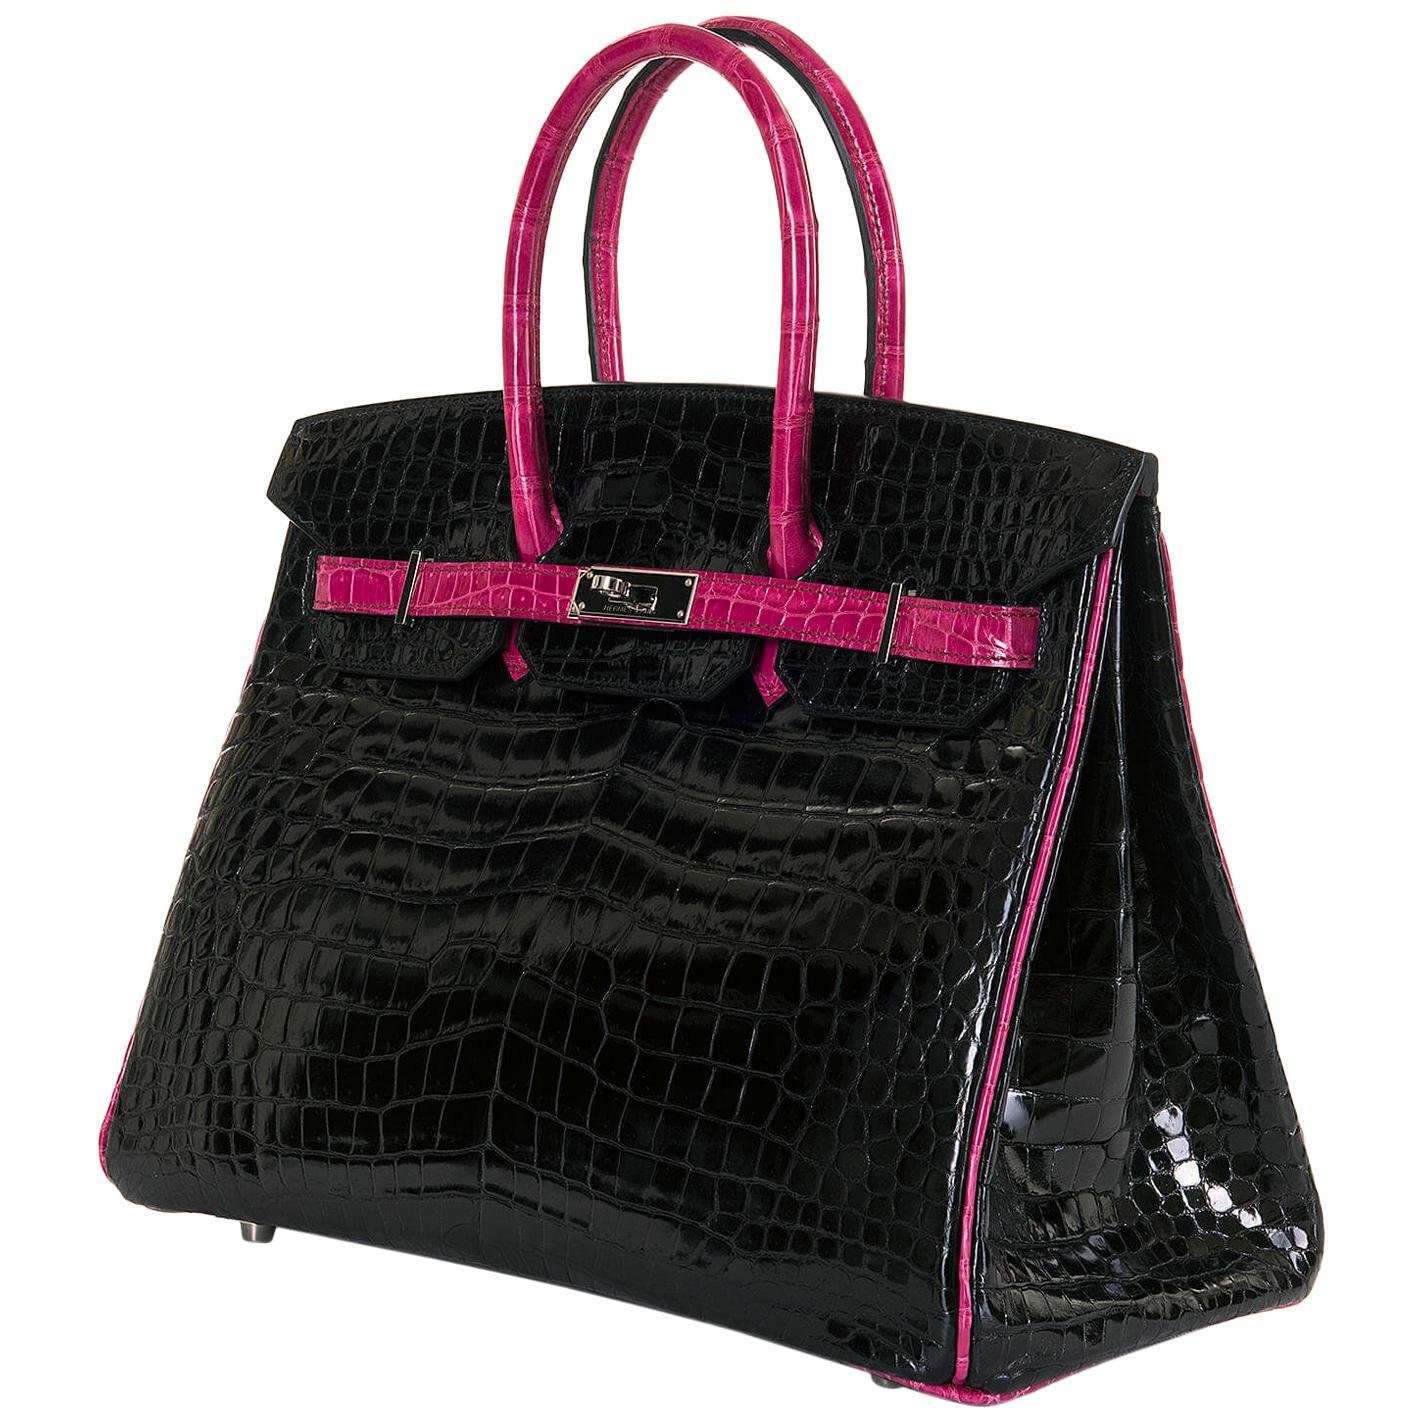 fd0ebb1e88fd Vintage and Designer Bags - 22